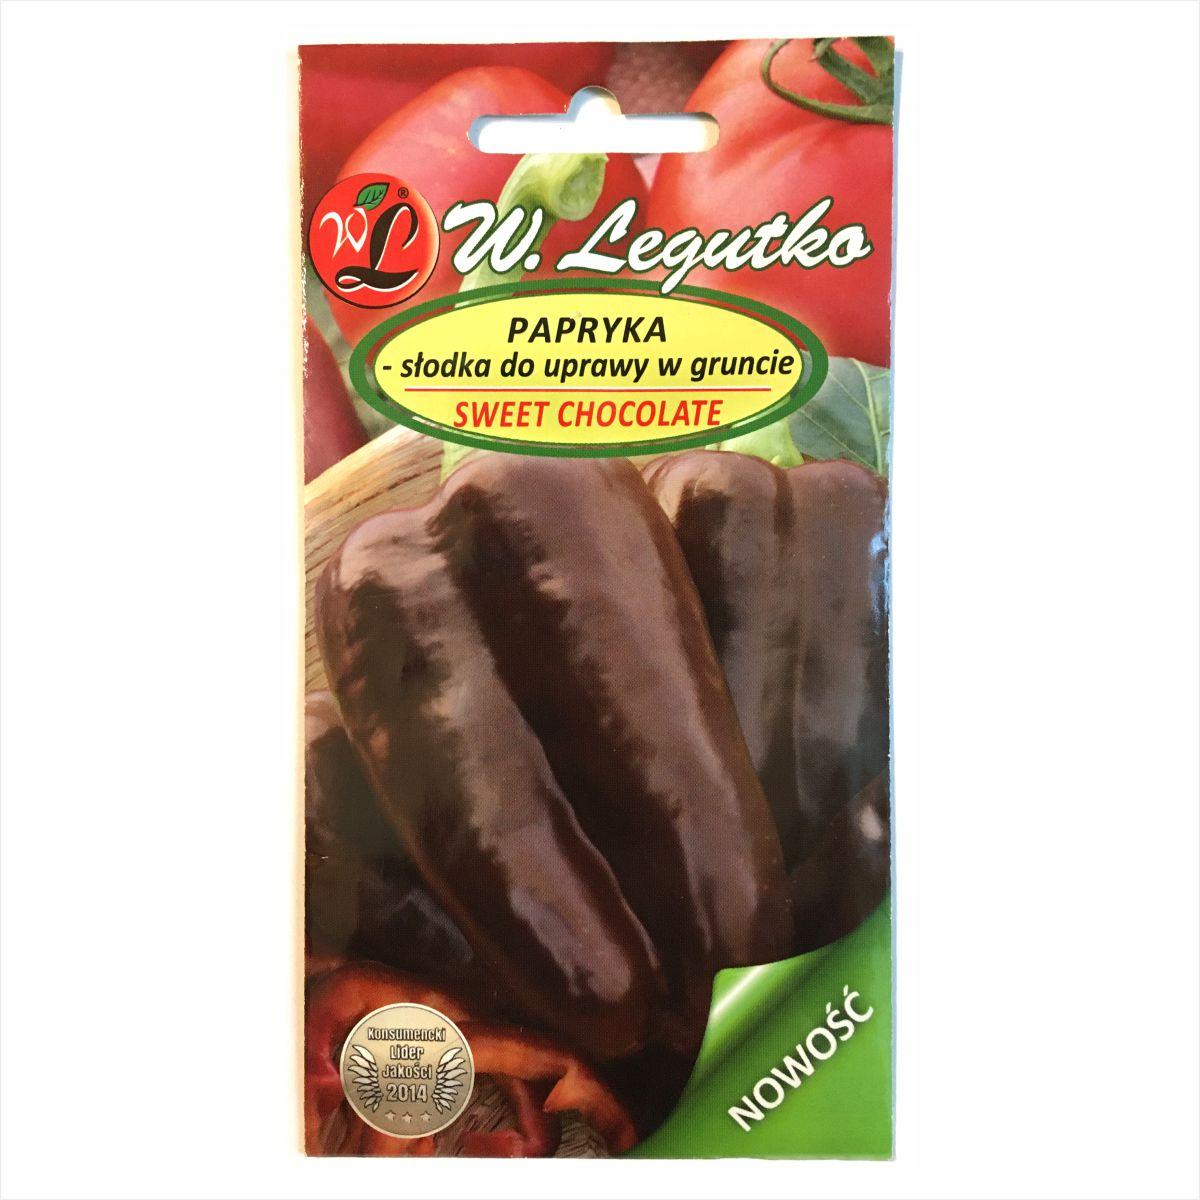 Papryka Sweet Chocolate nasiona Legutko